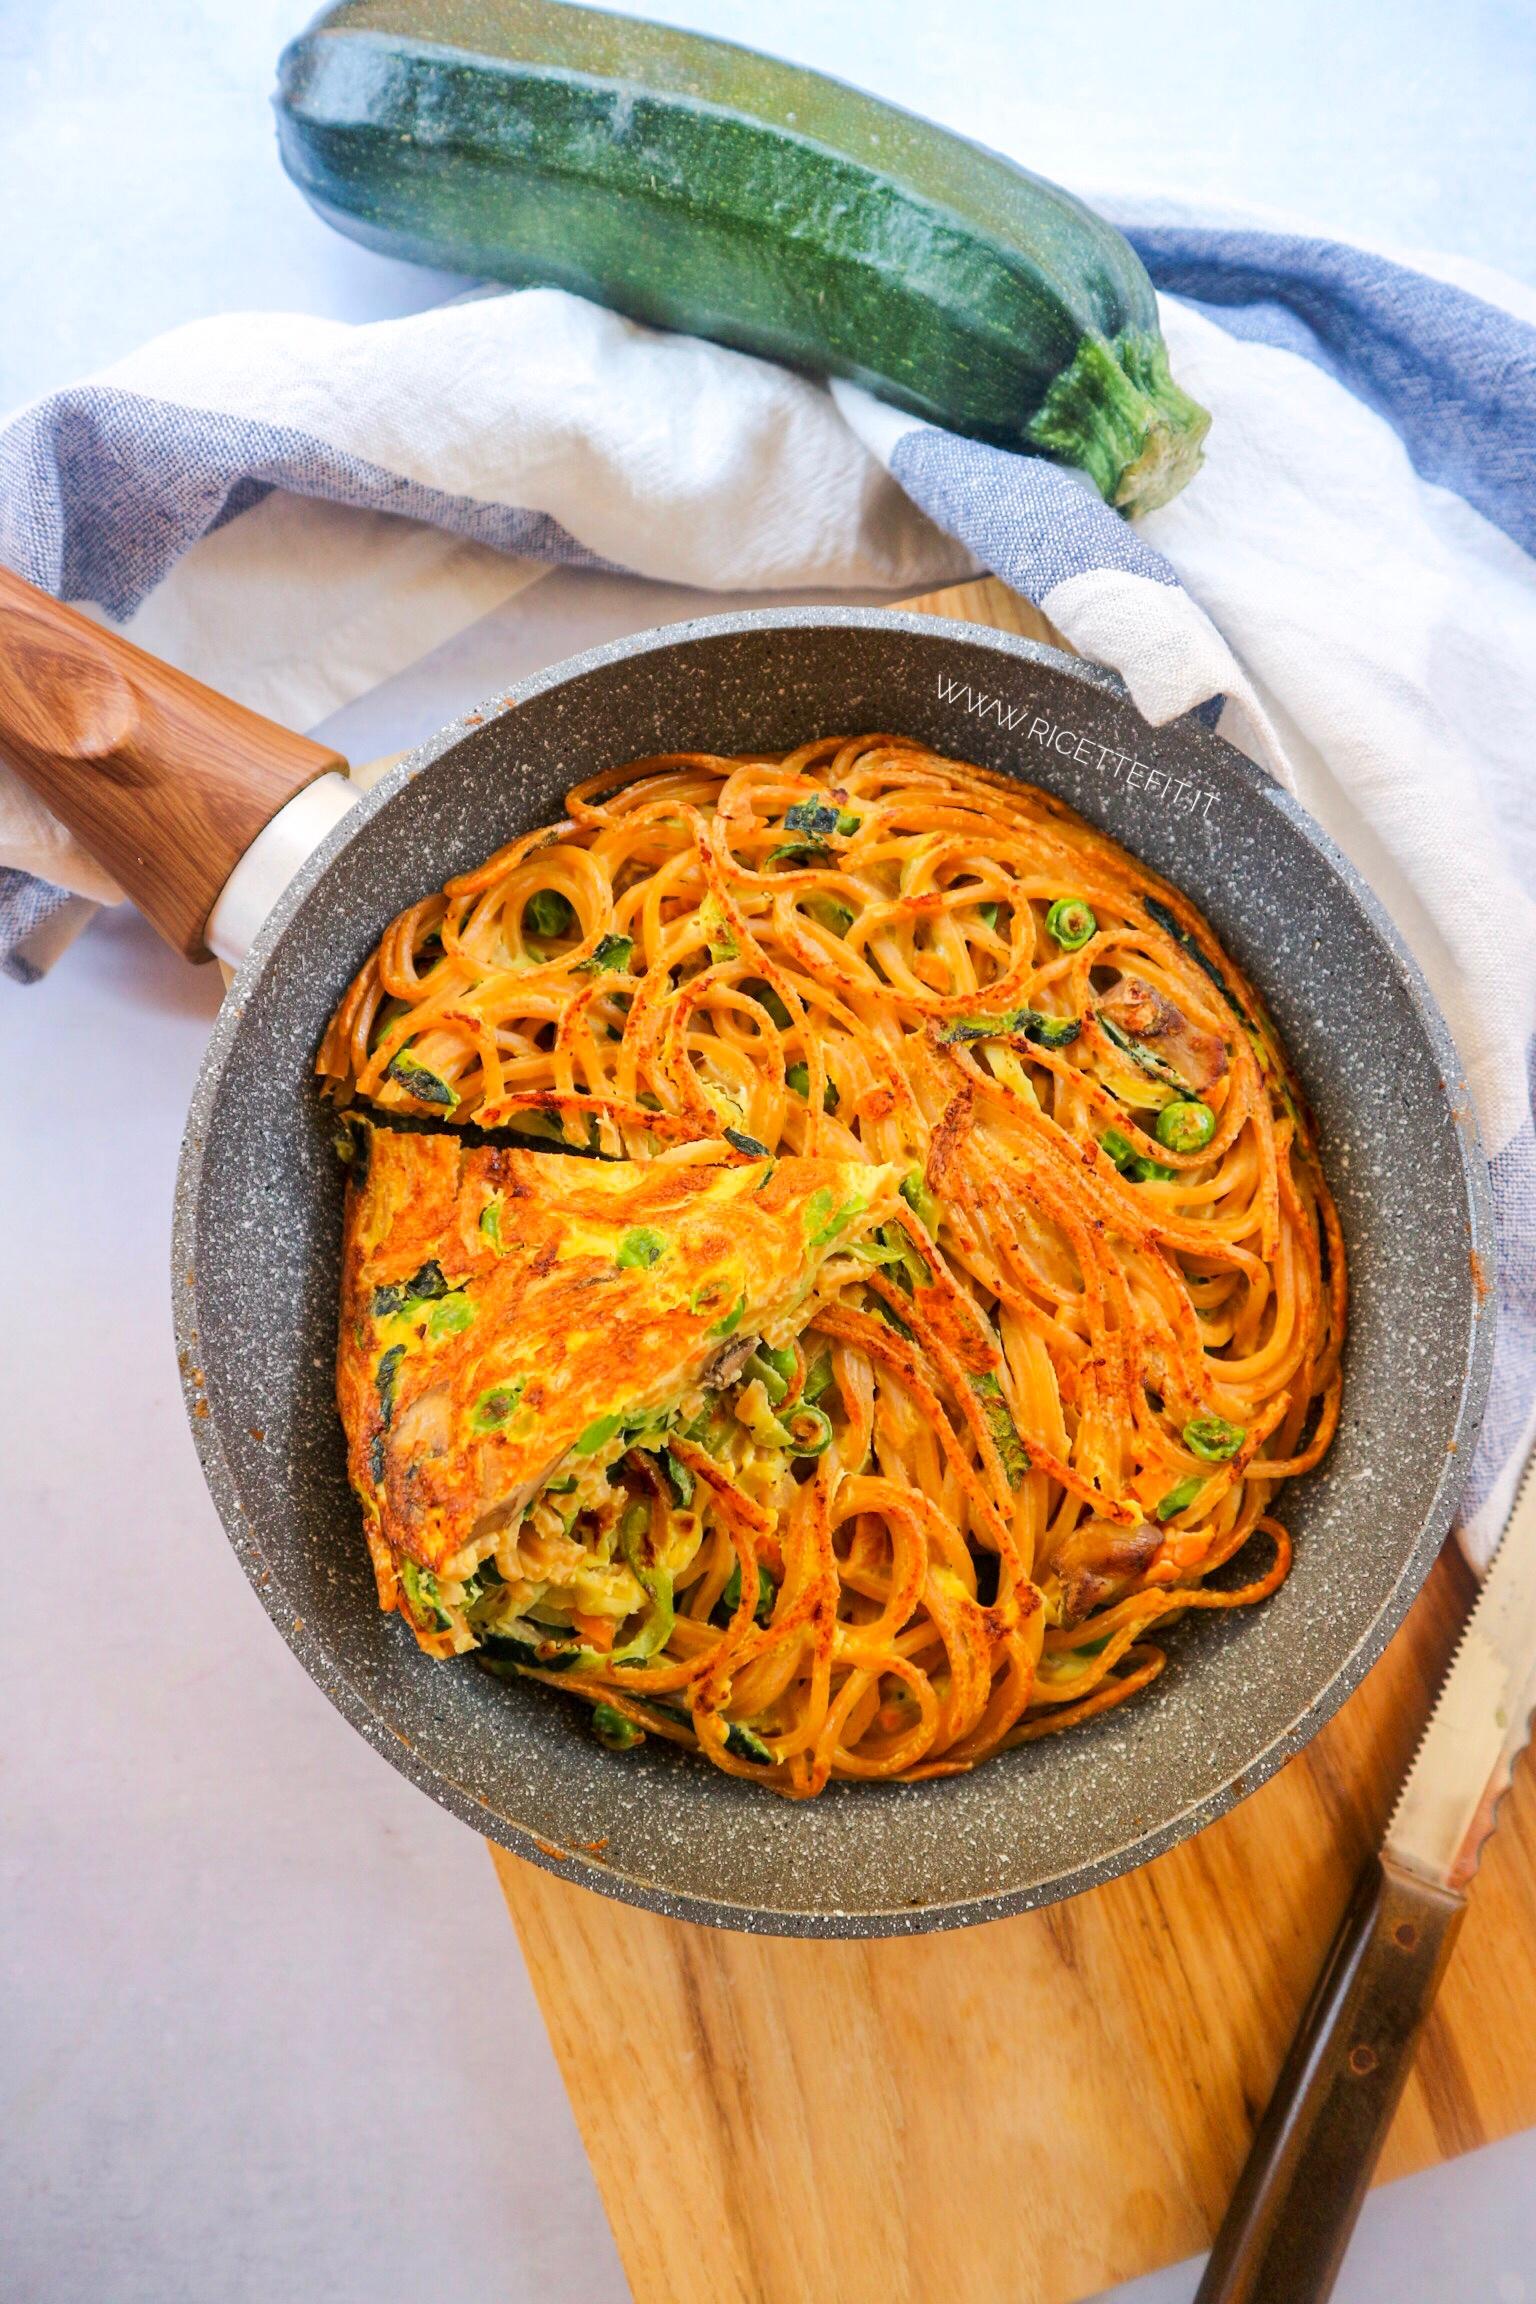 Noodles Ricetta Light.Ricette Fit Per Frittata Light Di Spaghetti E Verdure 490 Kcal Easy One Meal Pasta Omelette La Vie Est Fit